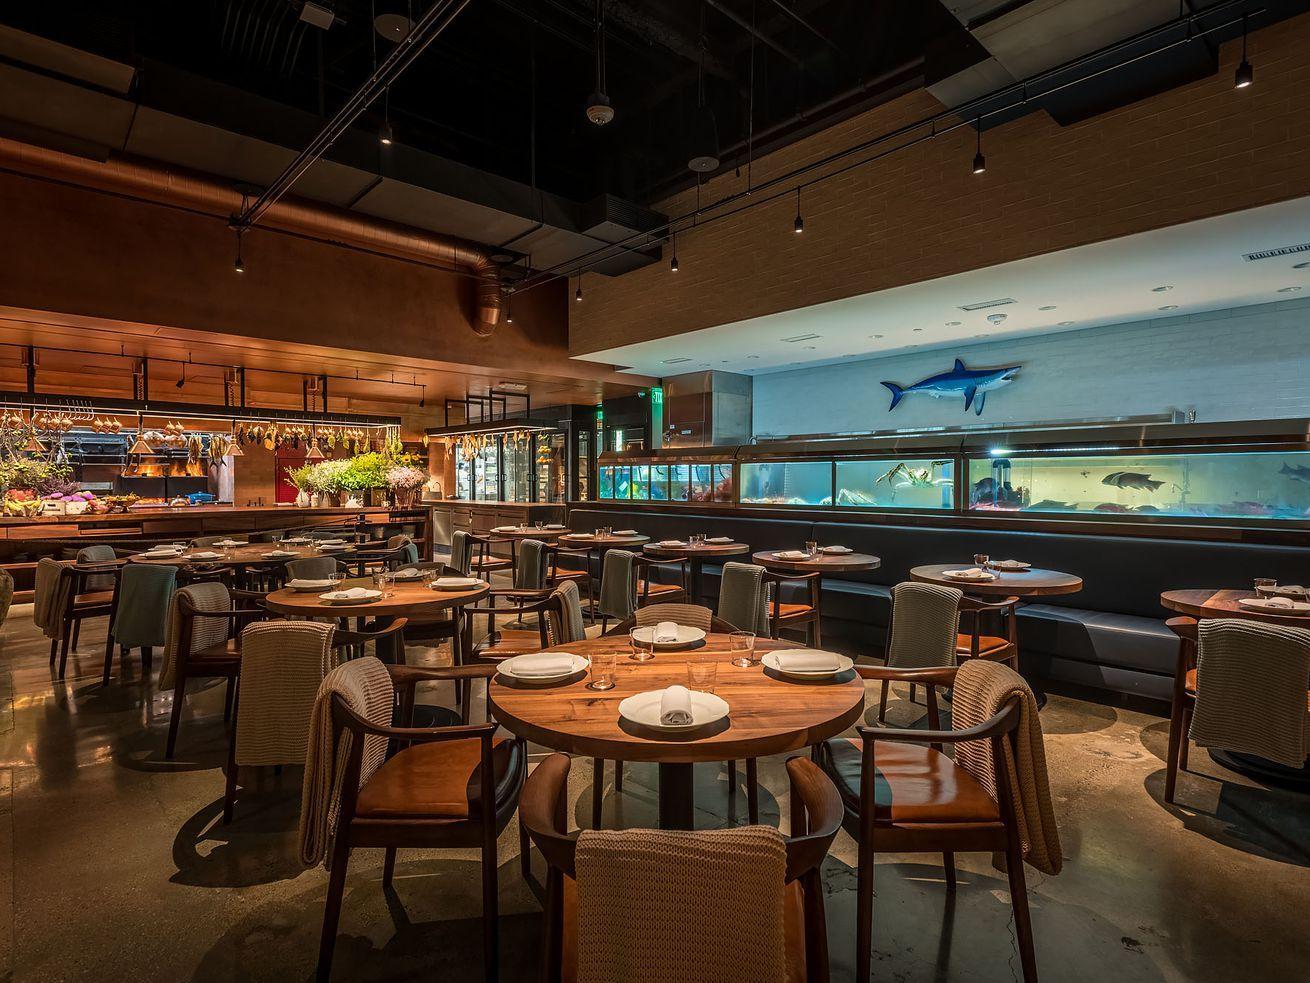 5 Restaurants To Try This Weekend In Los Angeles In 2020 Weekend In Los Angeles Los Angeles Restaurants Hispanic Food